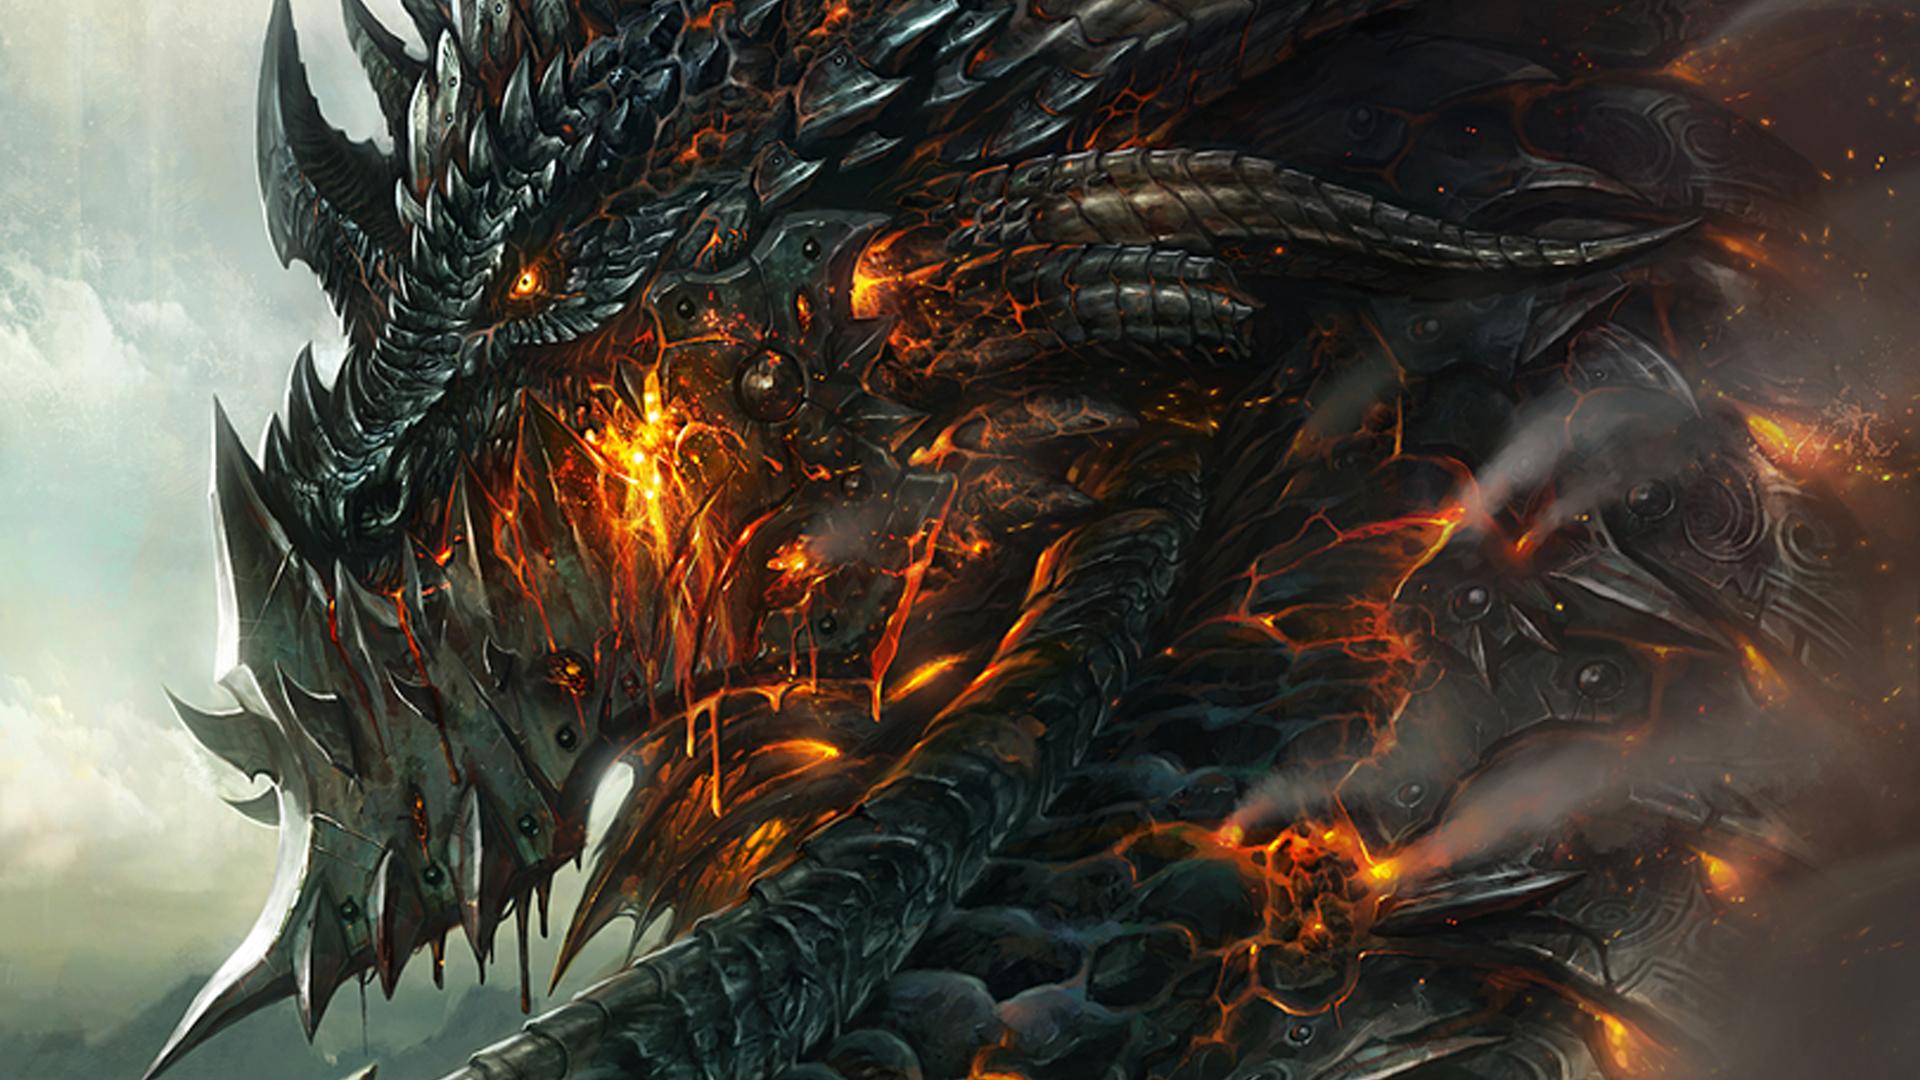 Firery Dragon Jessie Black Deviantart